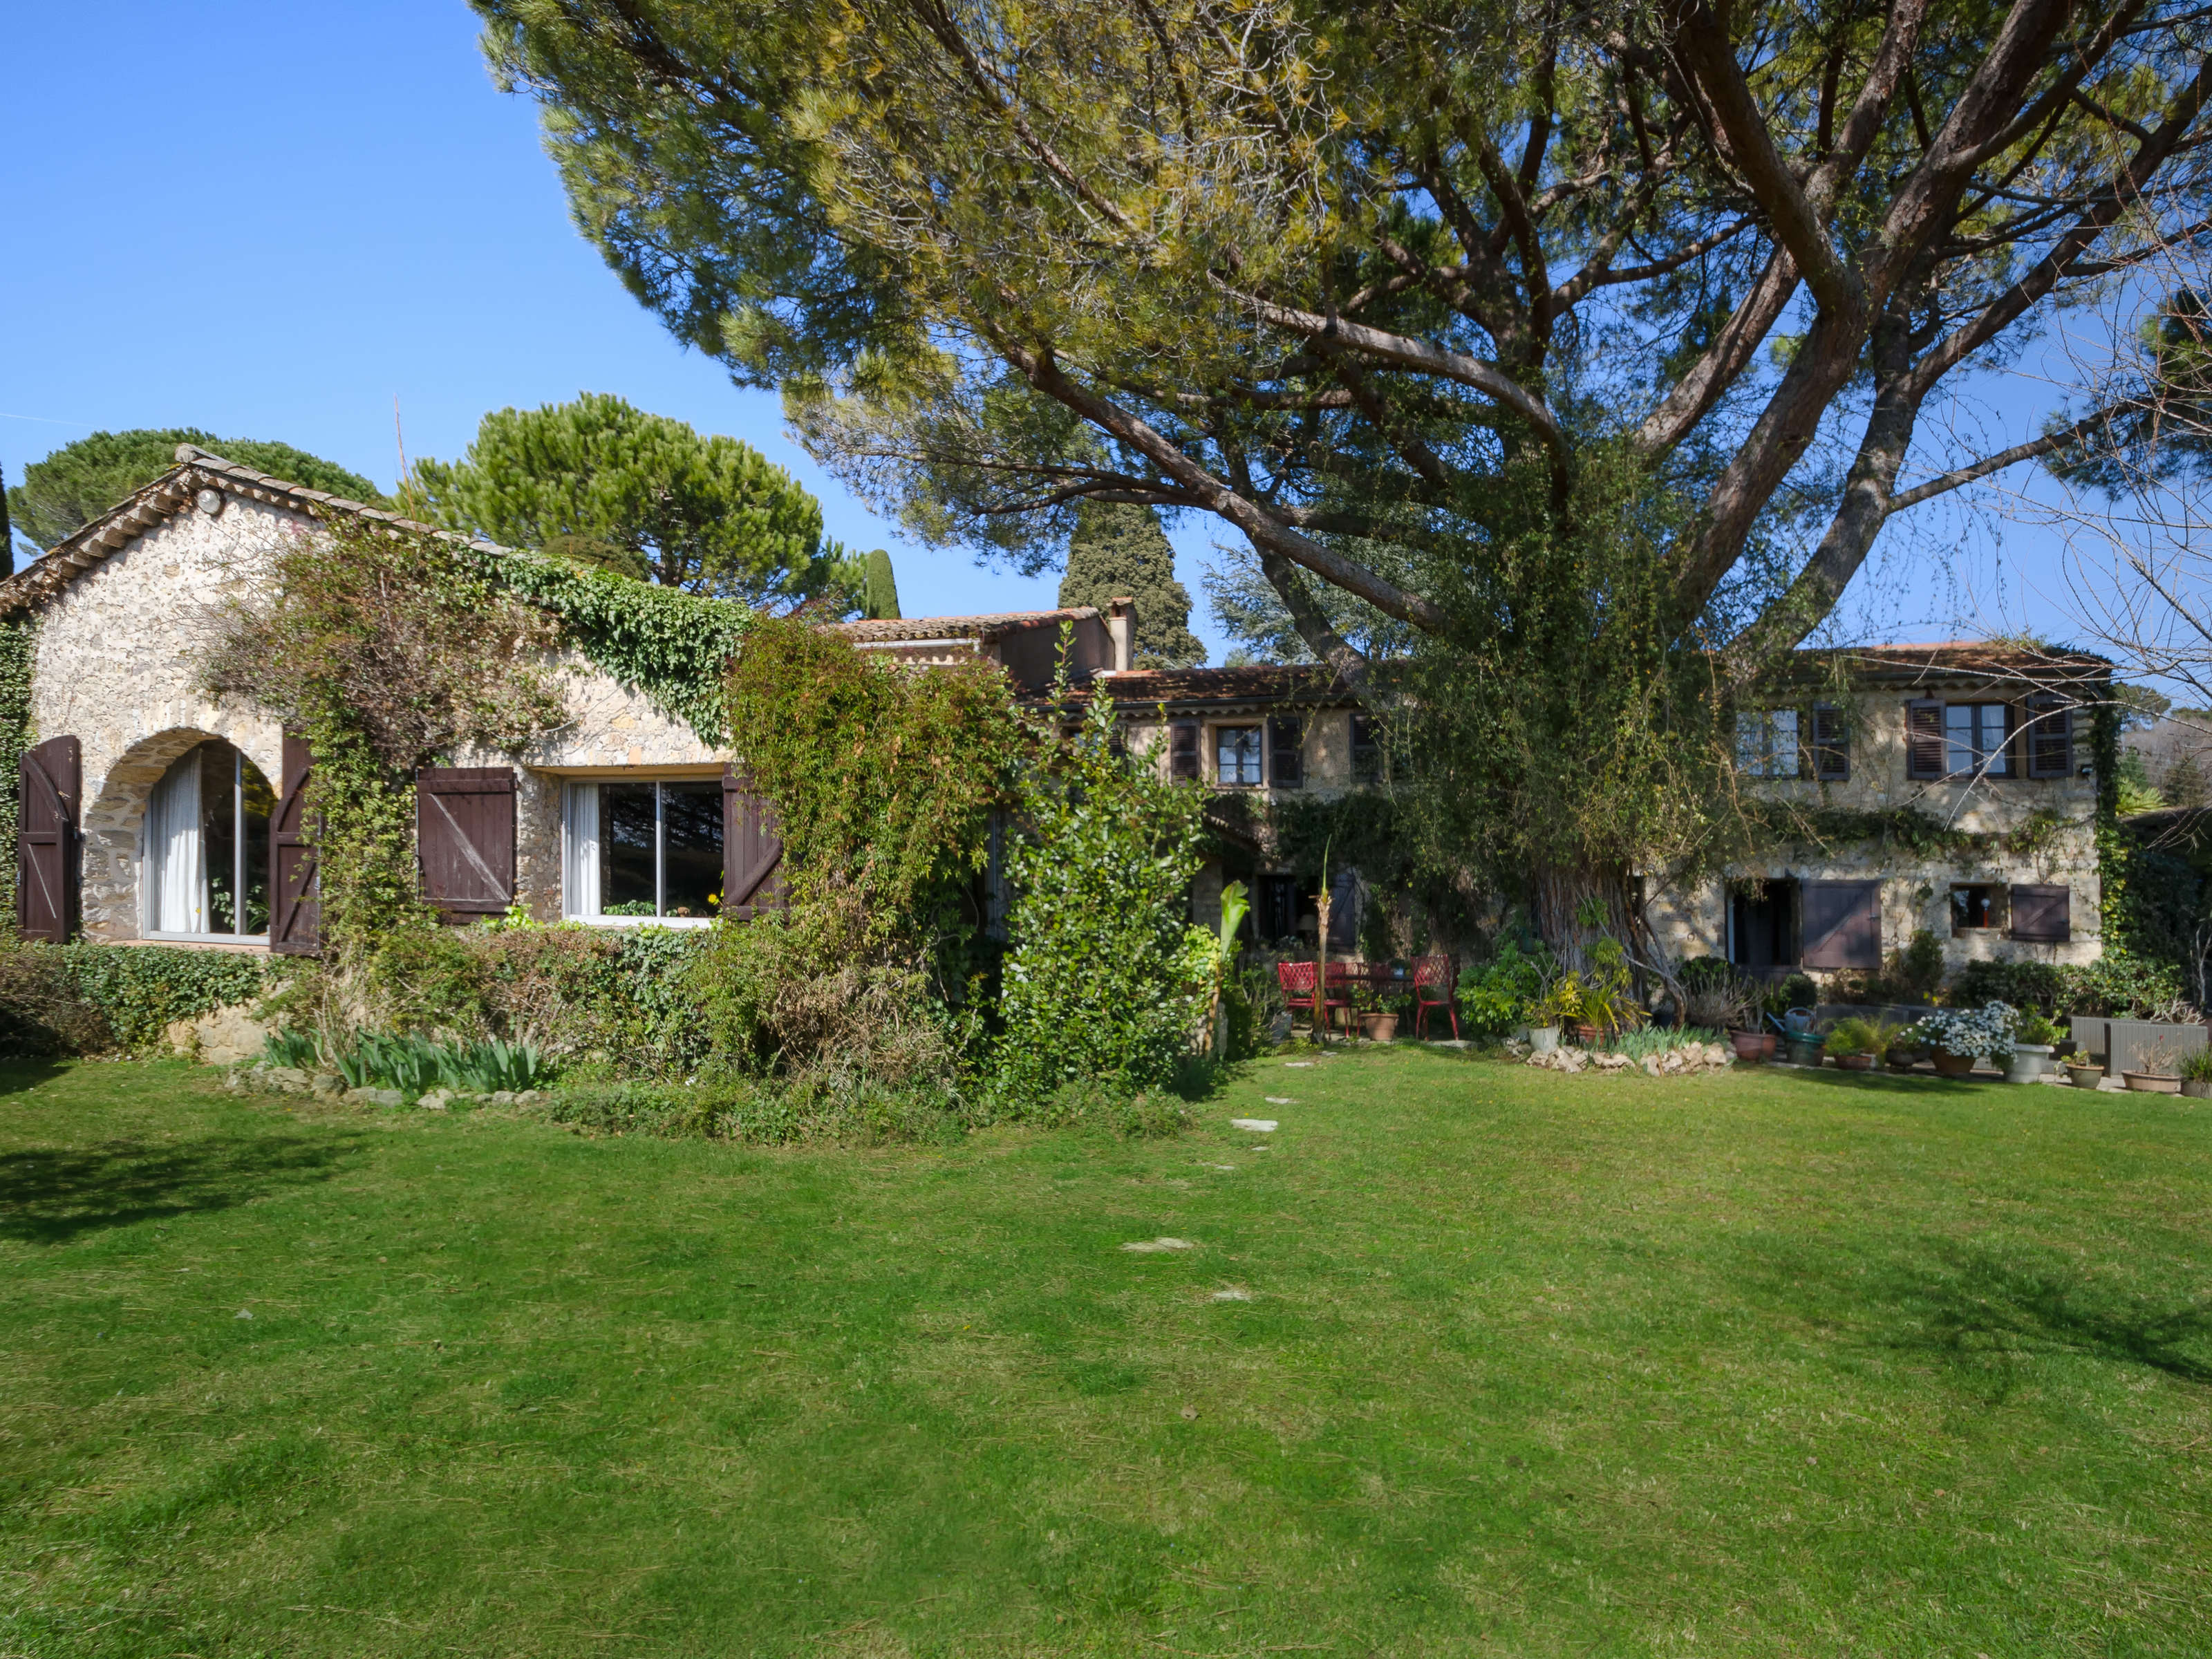 Single Family Home for Sale at 16th century provencal farmhouse Mougins, Provence-Alpes-Cote D'Azur 06250 France